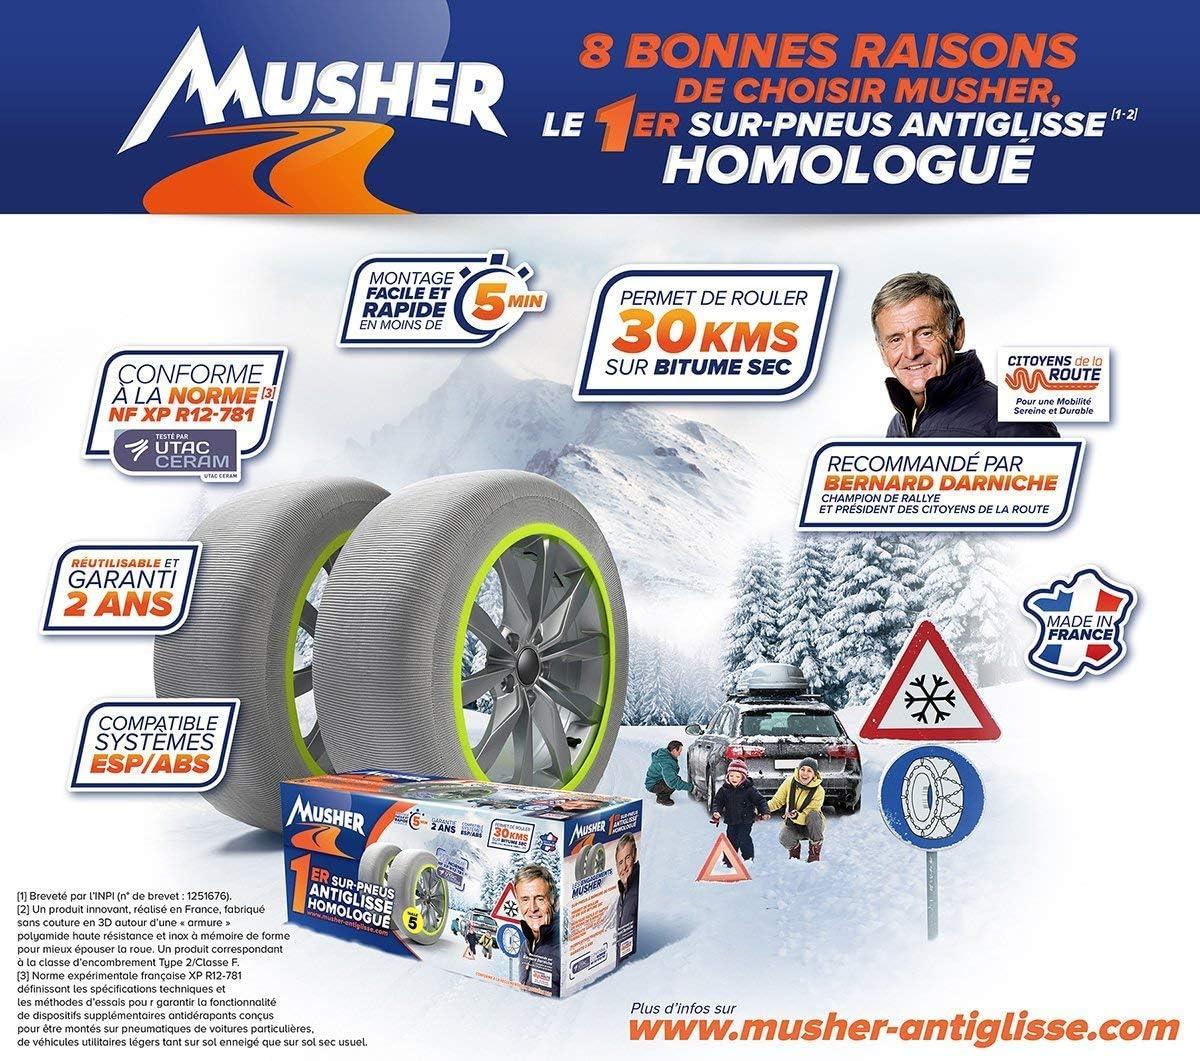 B26 Musher Chaussette Anti-Glisse n/°08 pour 235//55-17